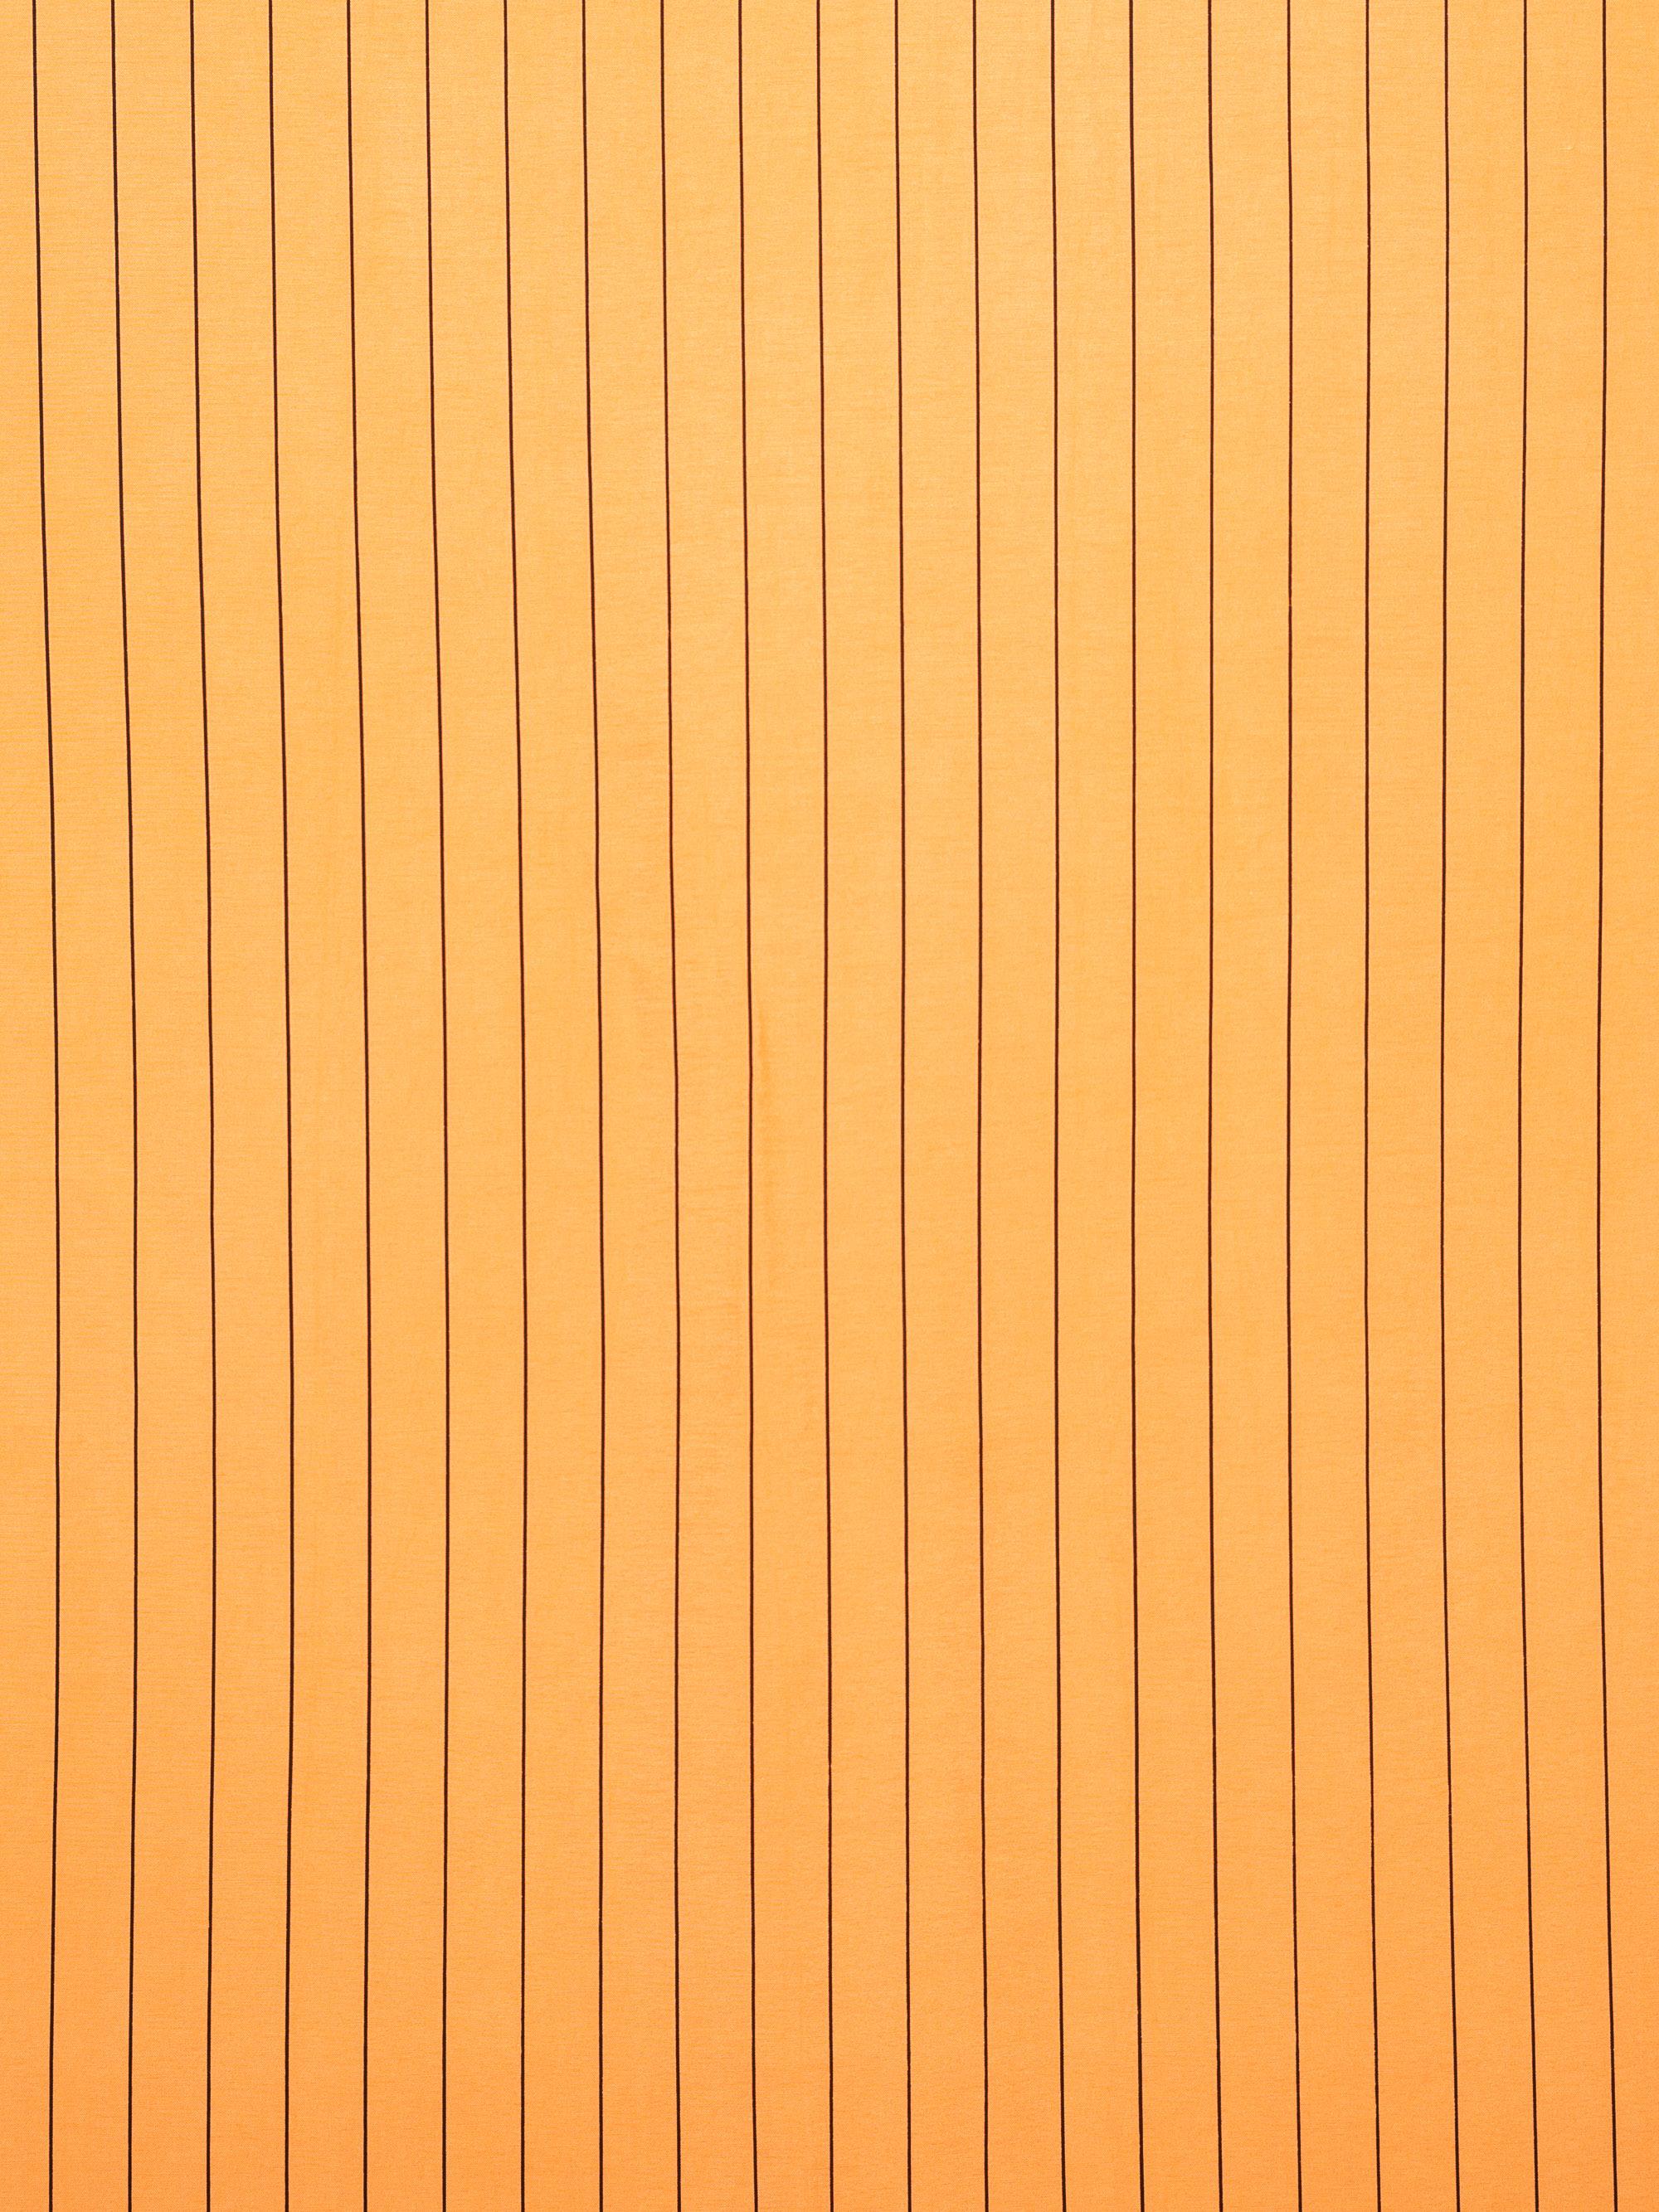 Orangerandigt